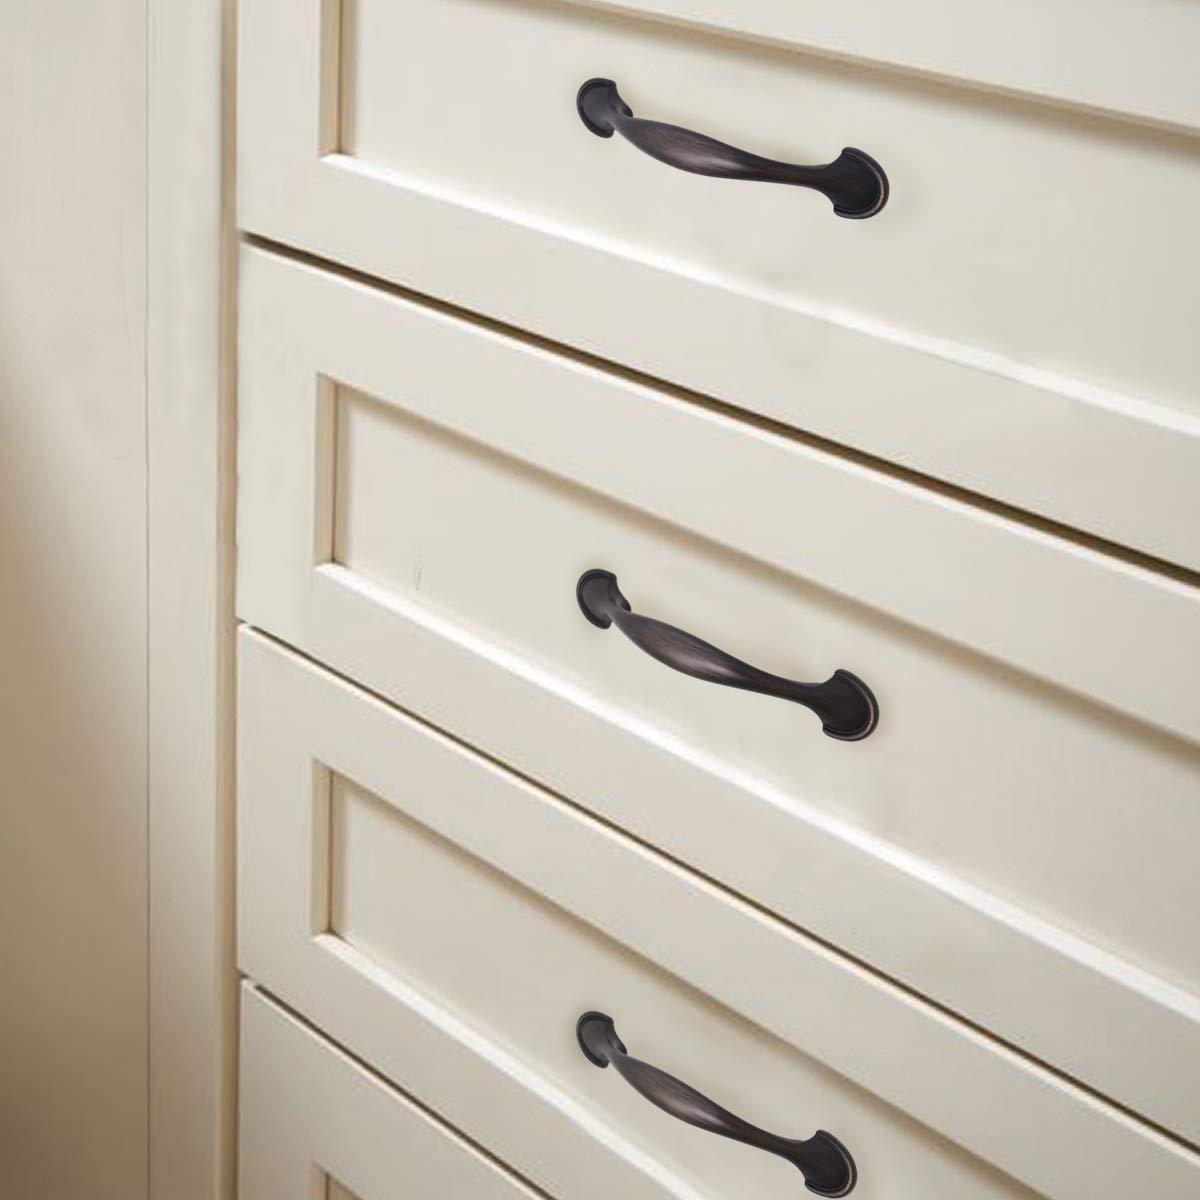 Probrico Cabinet Handles 3 Inch,Brushed Nickel Kitchen Cabinet Pulls,Dresser Pulls Closet Door Handles,Hardware for Cupboard Wardrobe Chest of Drawers,Euro Style 20 Pack